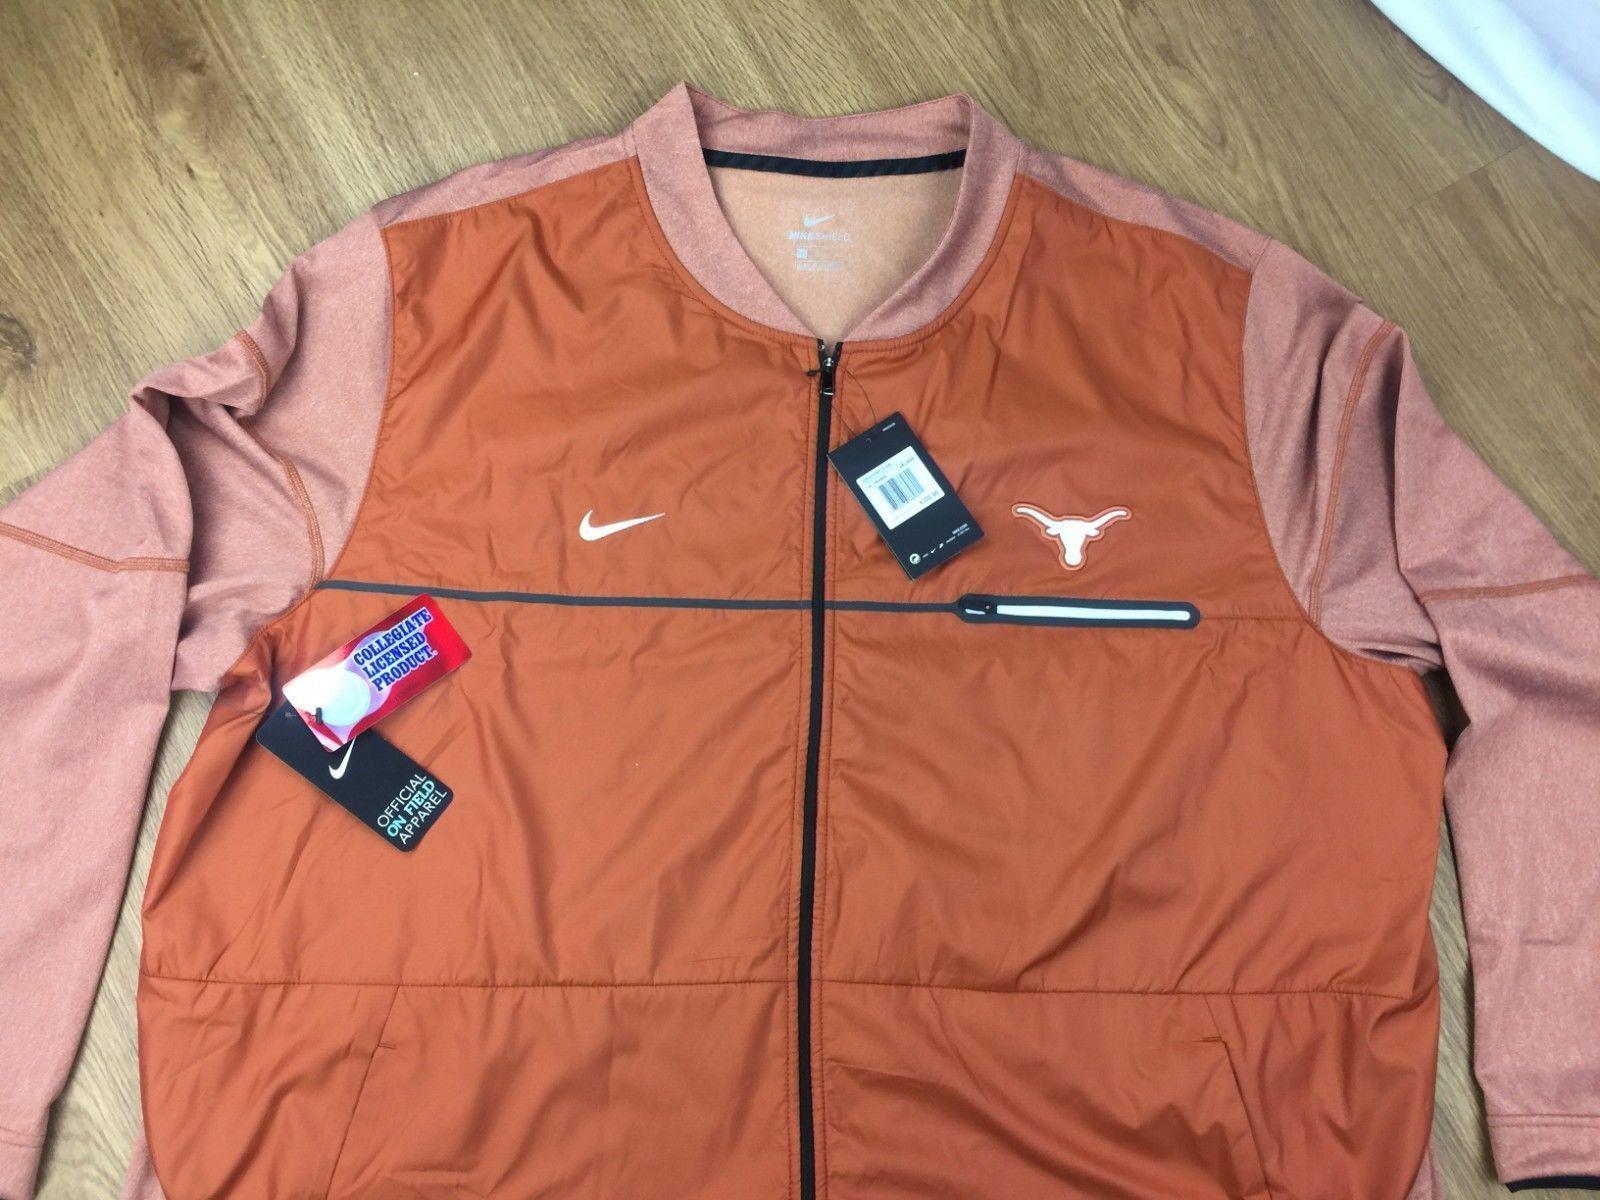 18ea11c69a66f Texas Longhorns Nike Shield Burnt Orange and 50 similar items. 57